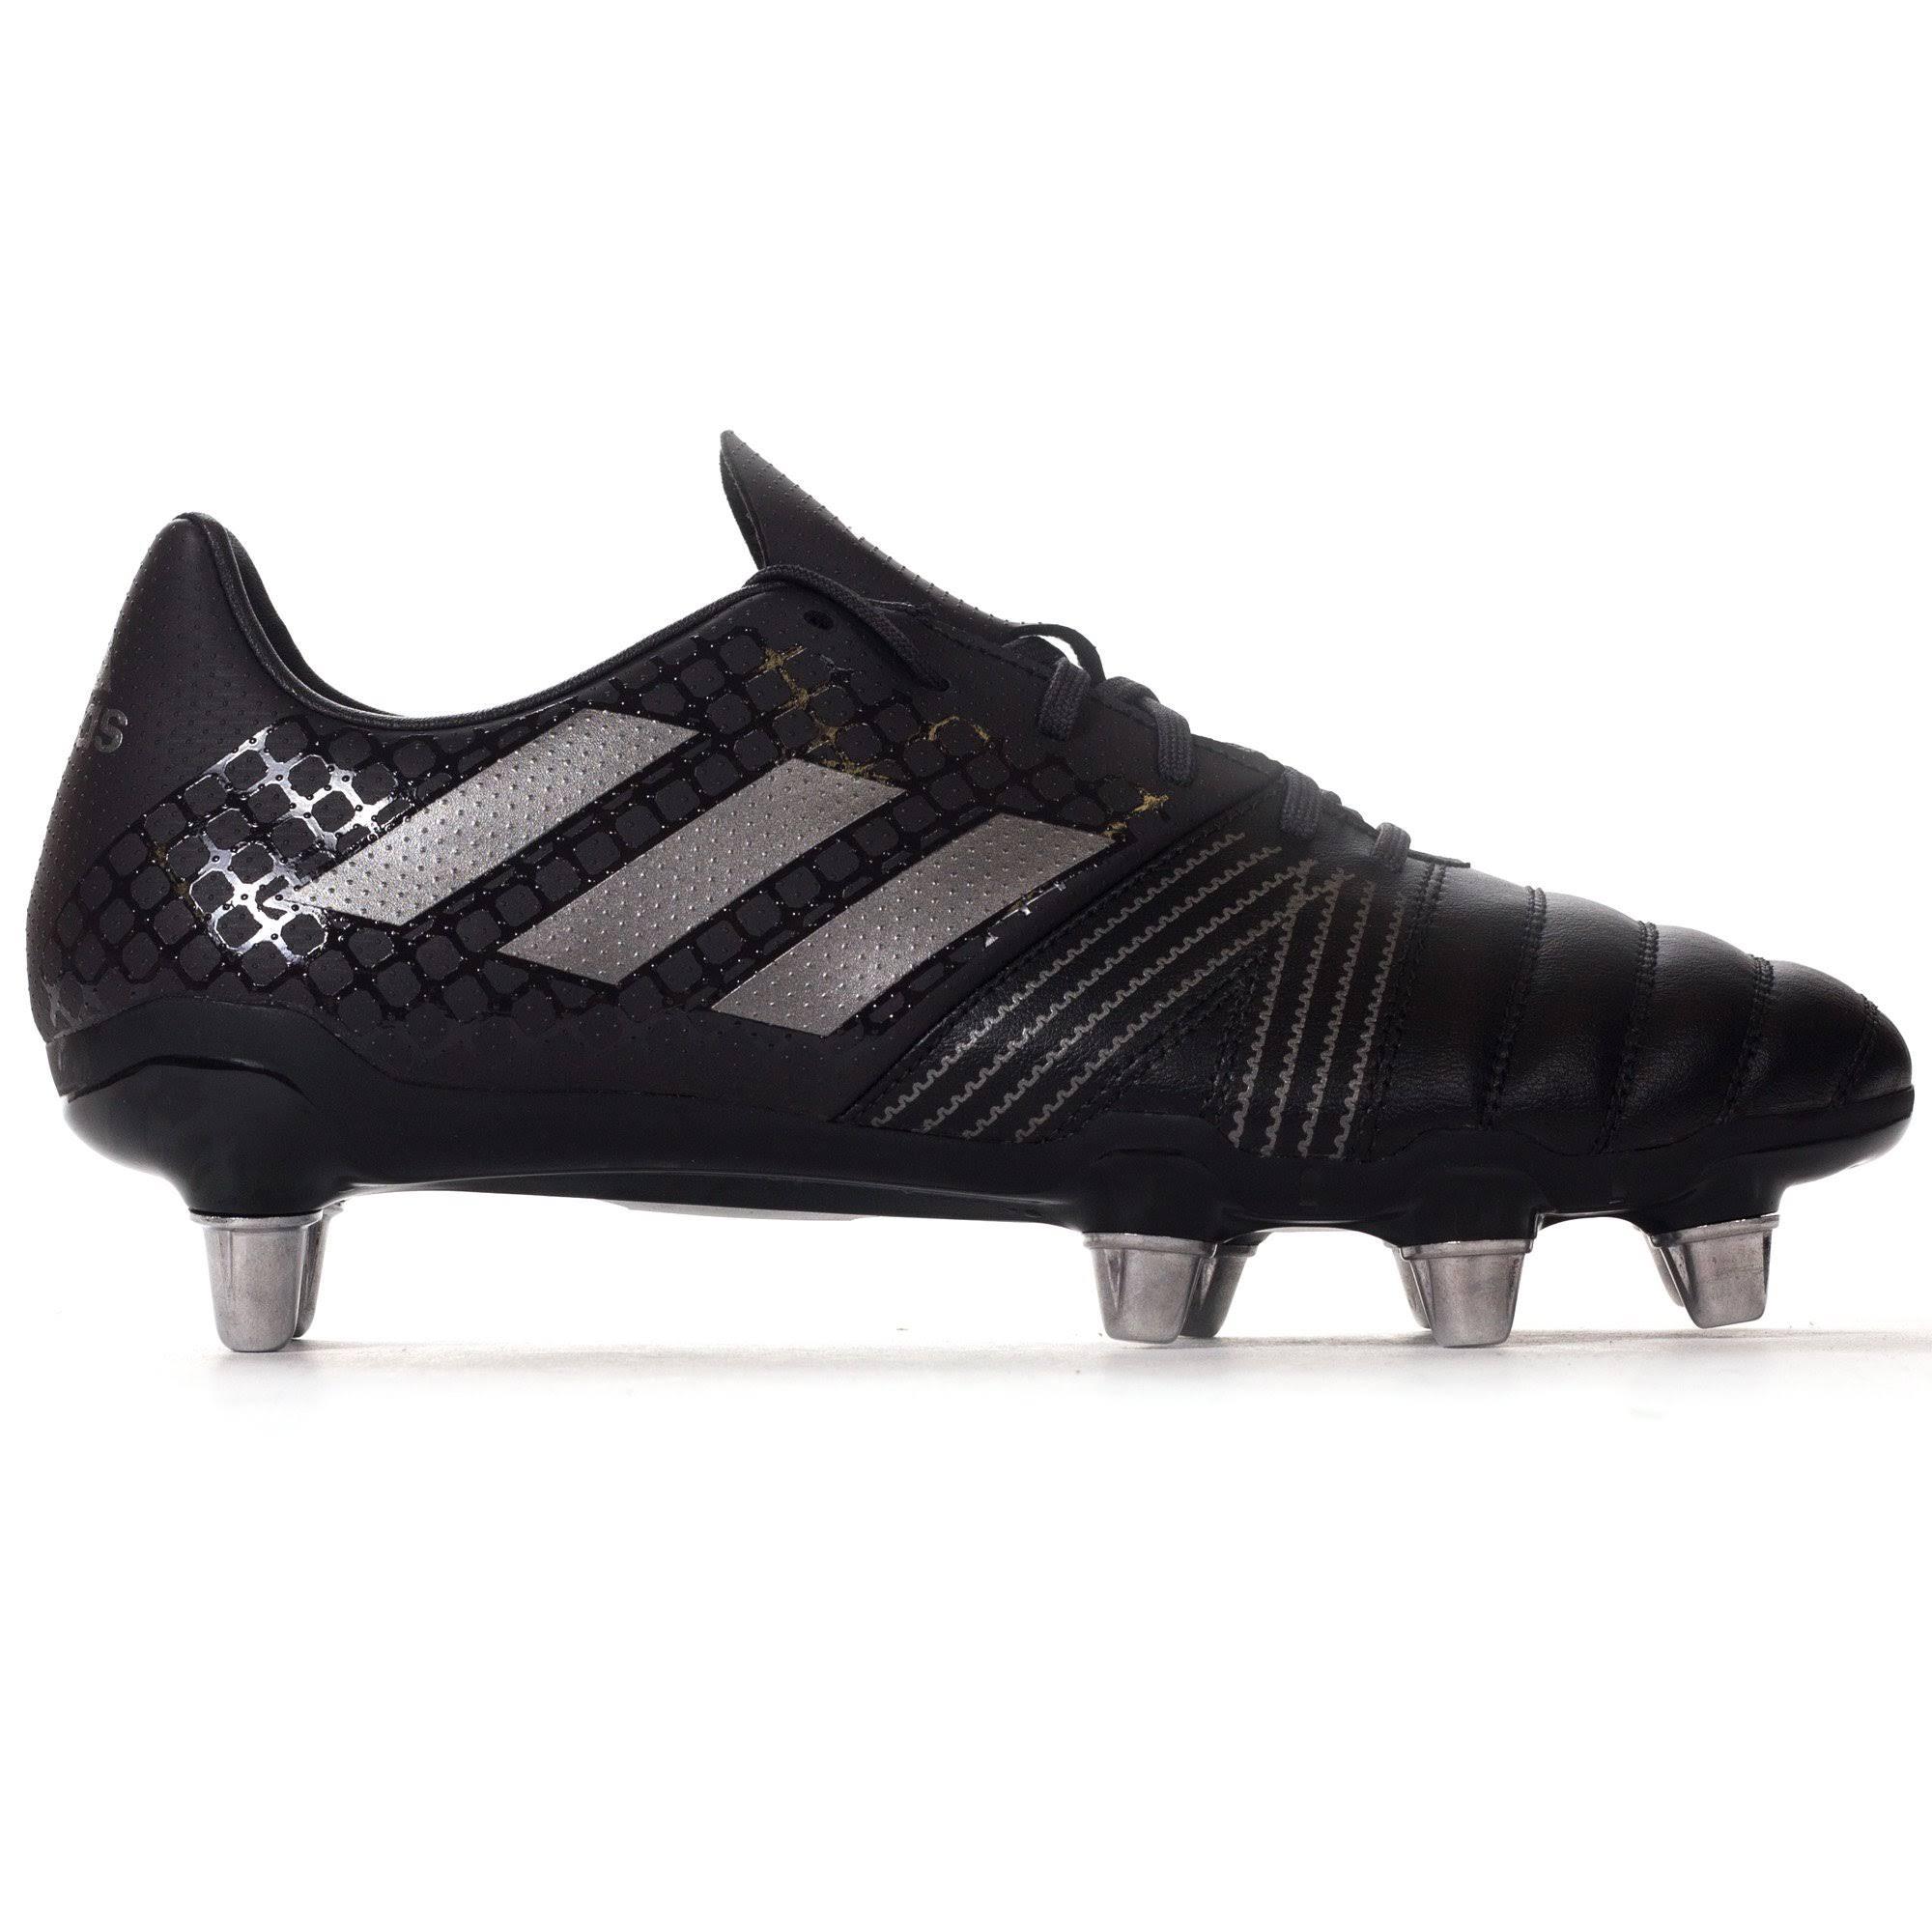 Adidas Kakari SG Boots Rugby - Mens - Black